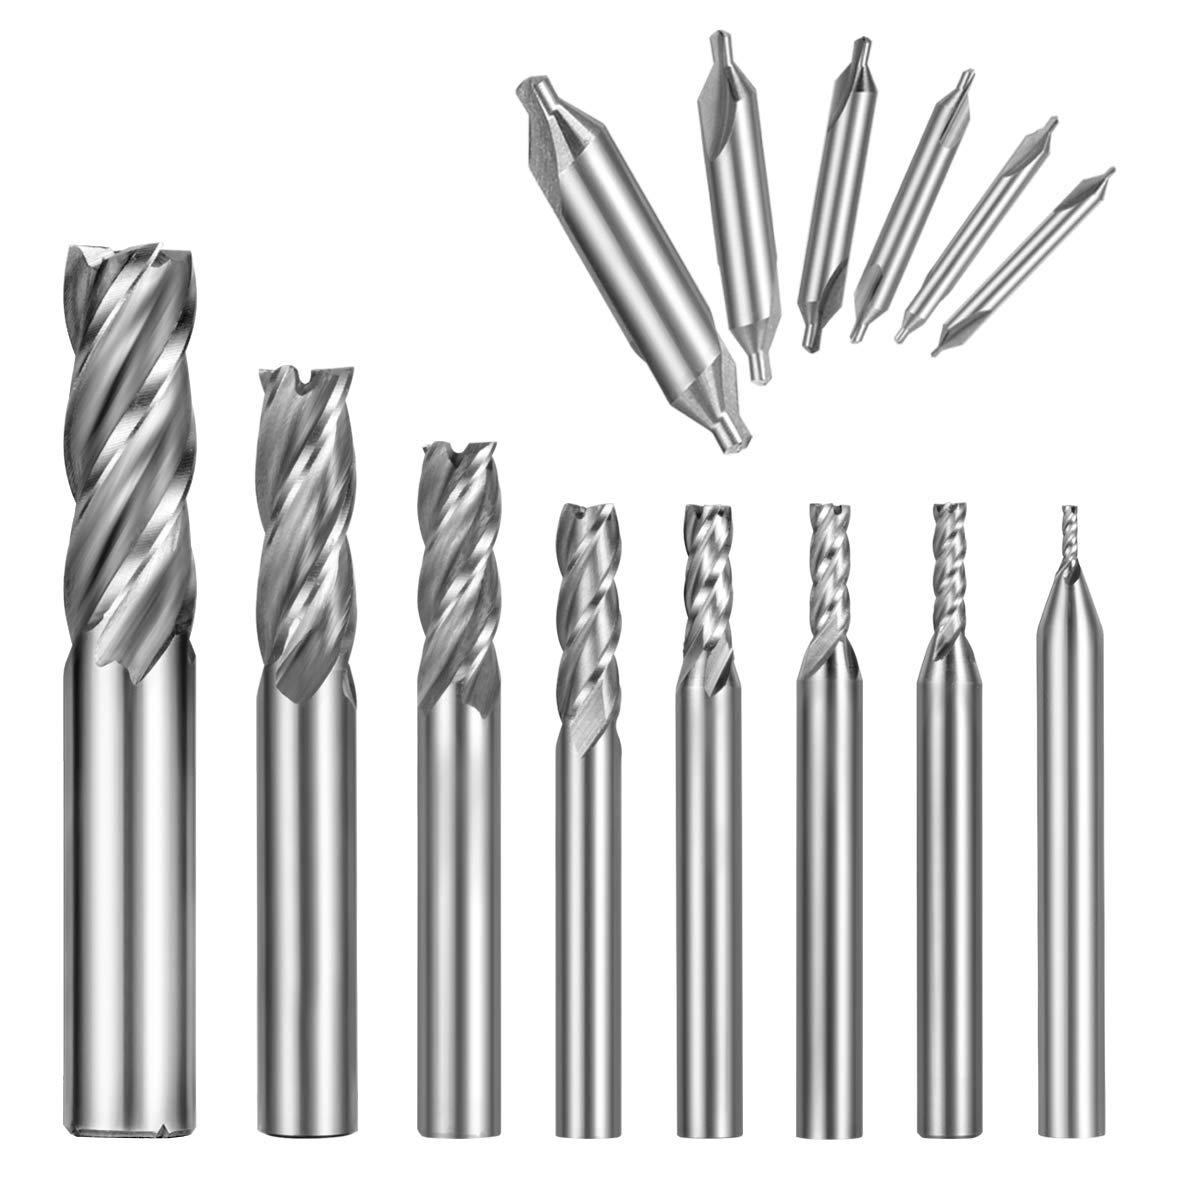 Qibaok 8PCS End Mill Bits, HSS CNC Cutter Drill Bits Straight 4 Flute Mill Bit Set + 6PCS Center Drill Bits, HSS Lathe Mill 60 Degrees Countersink Drill Bits for Wood, Aluminum, Steel, Titanium